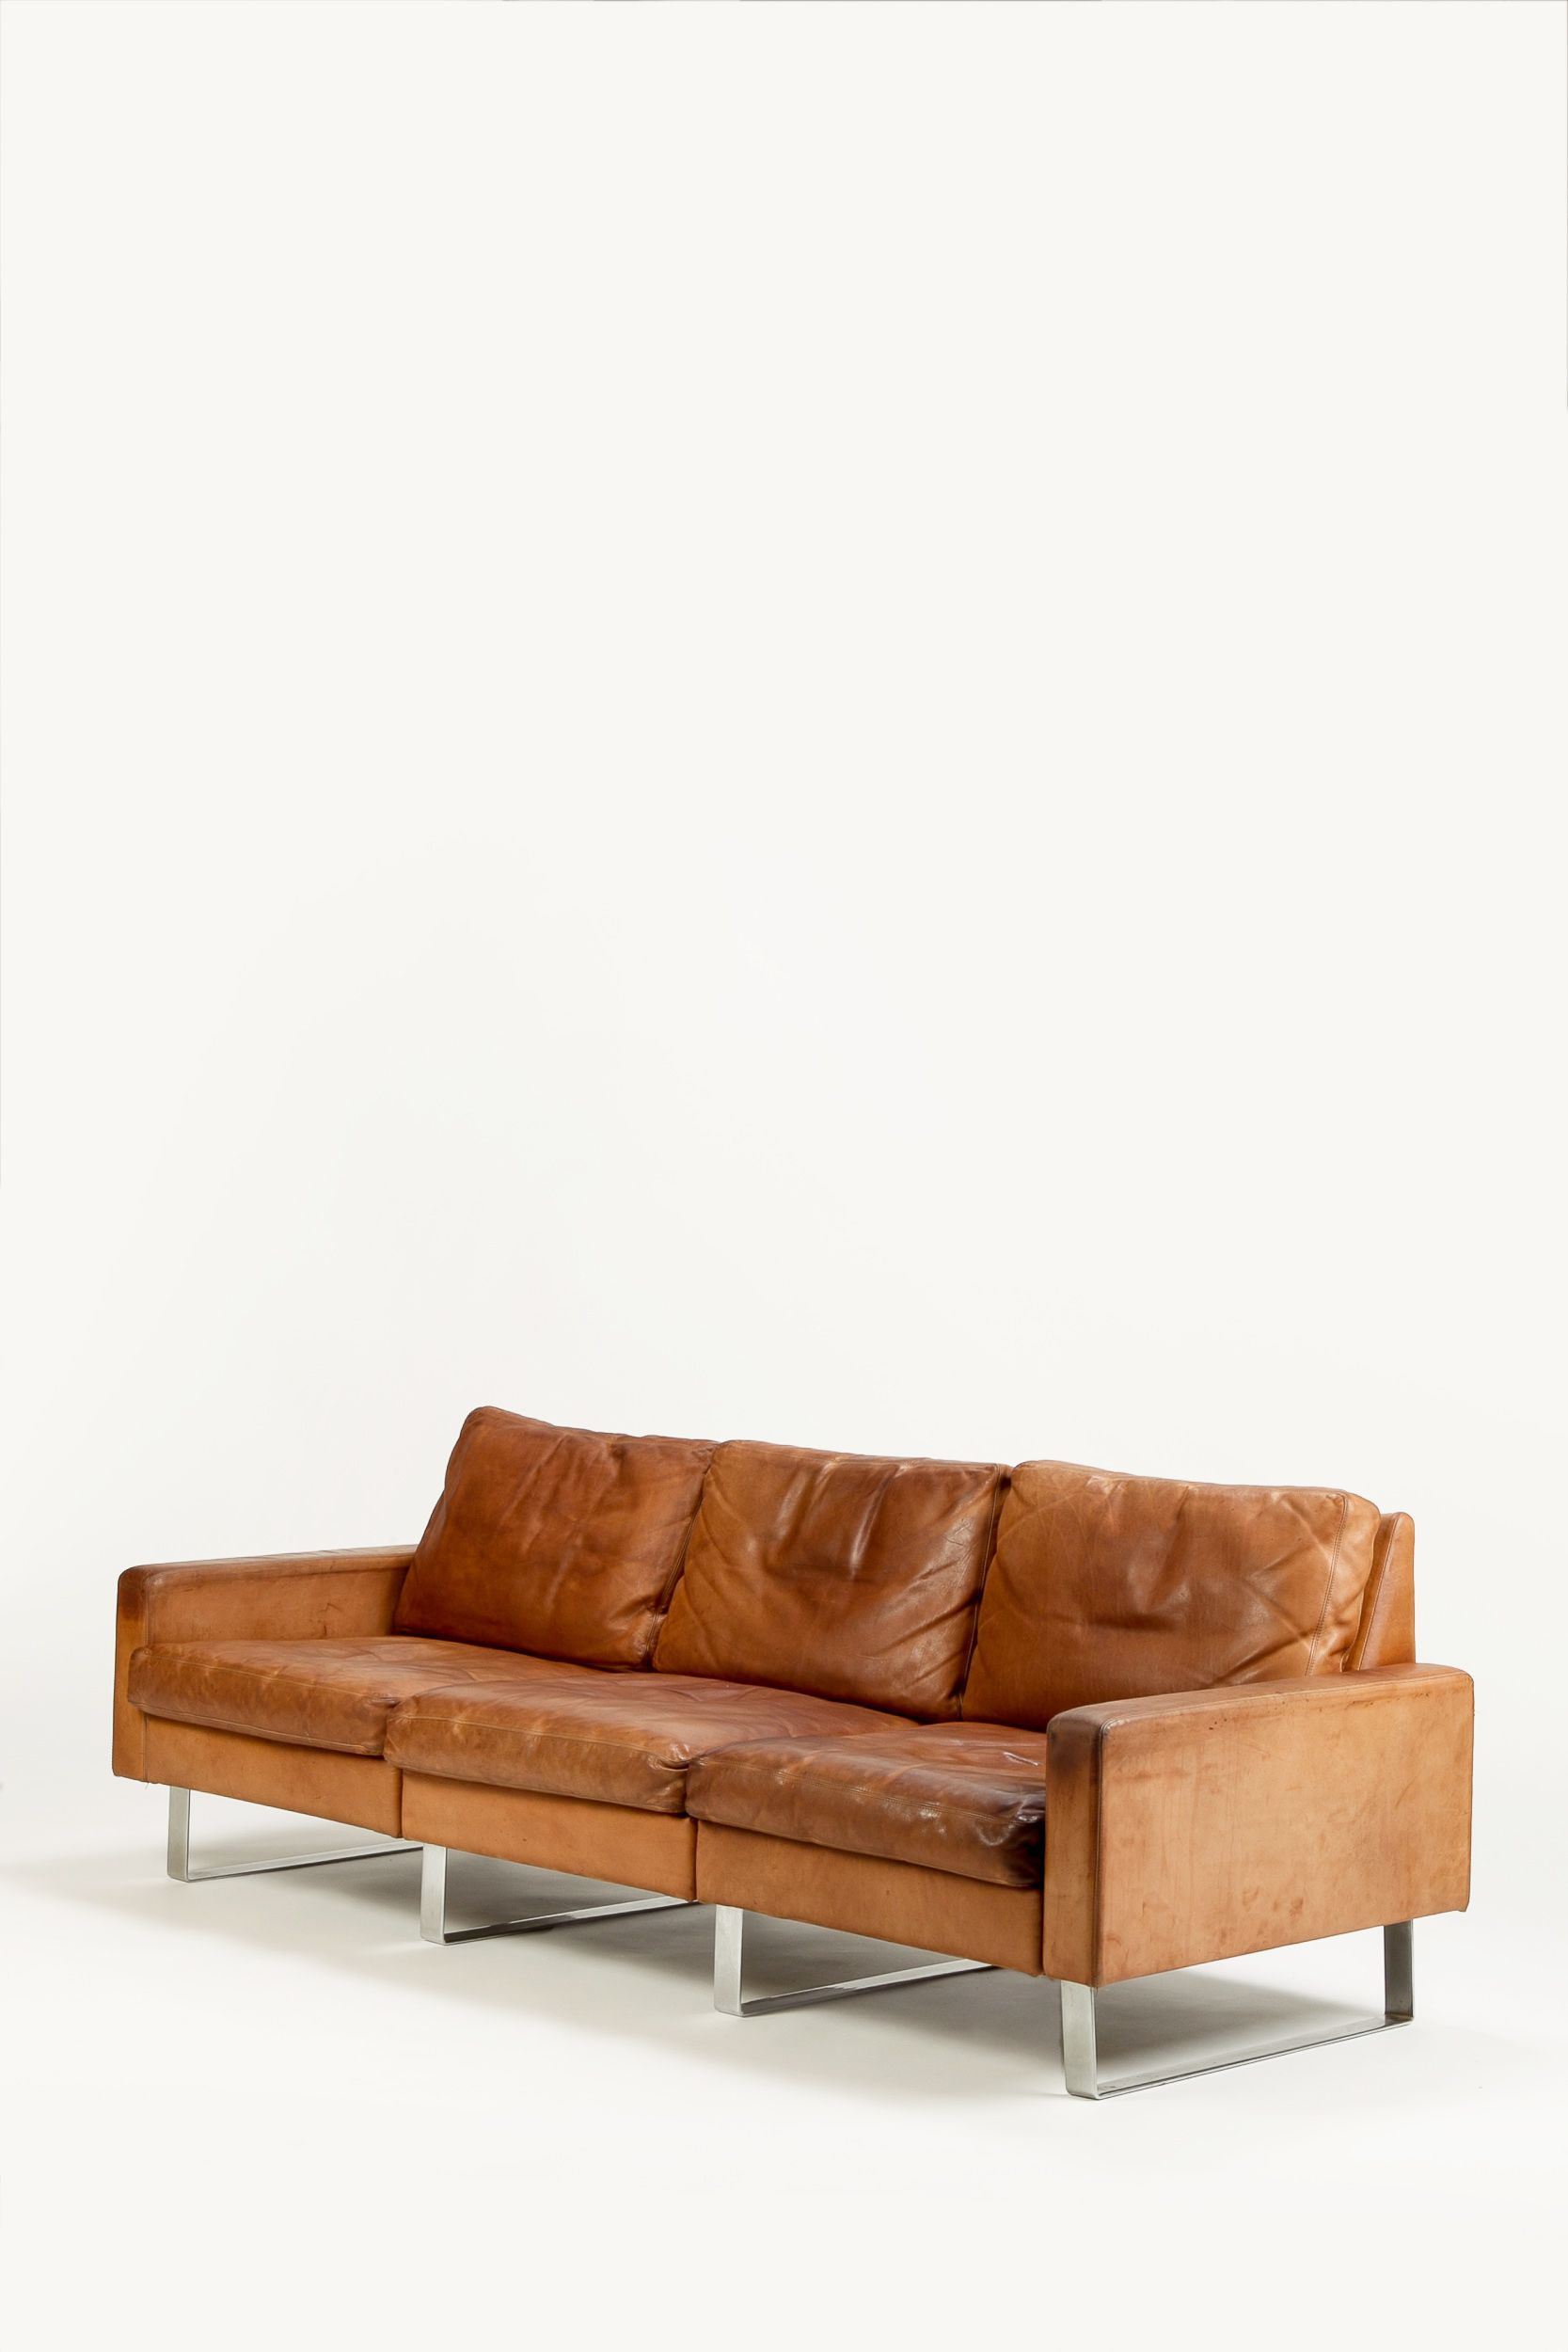 Friedrich Wilhelm Möller Conseta Sofa For Cor Sitzcomfort 1960s